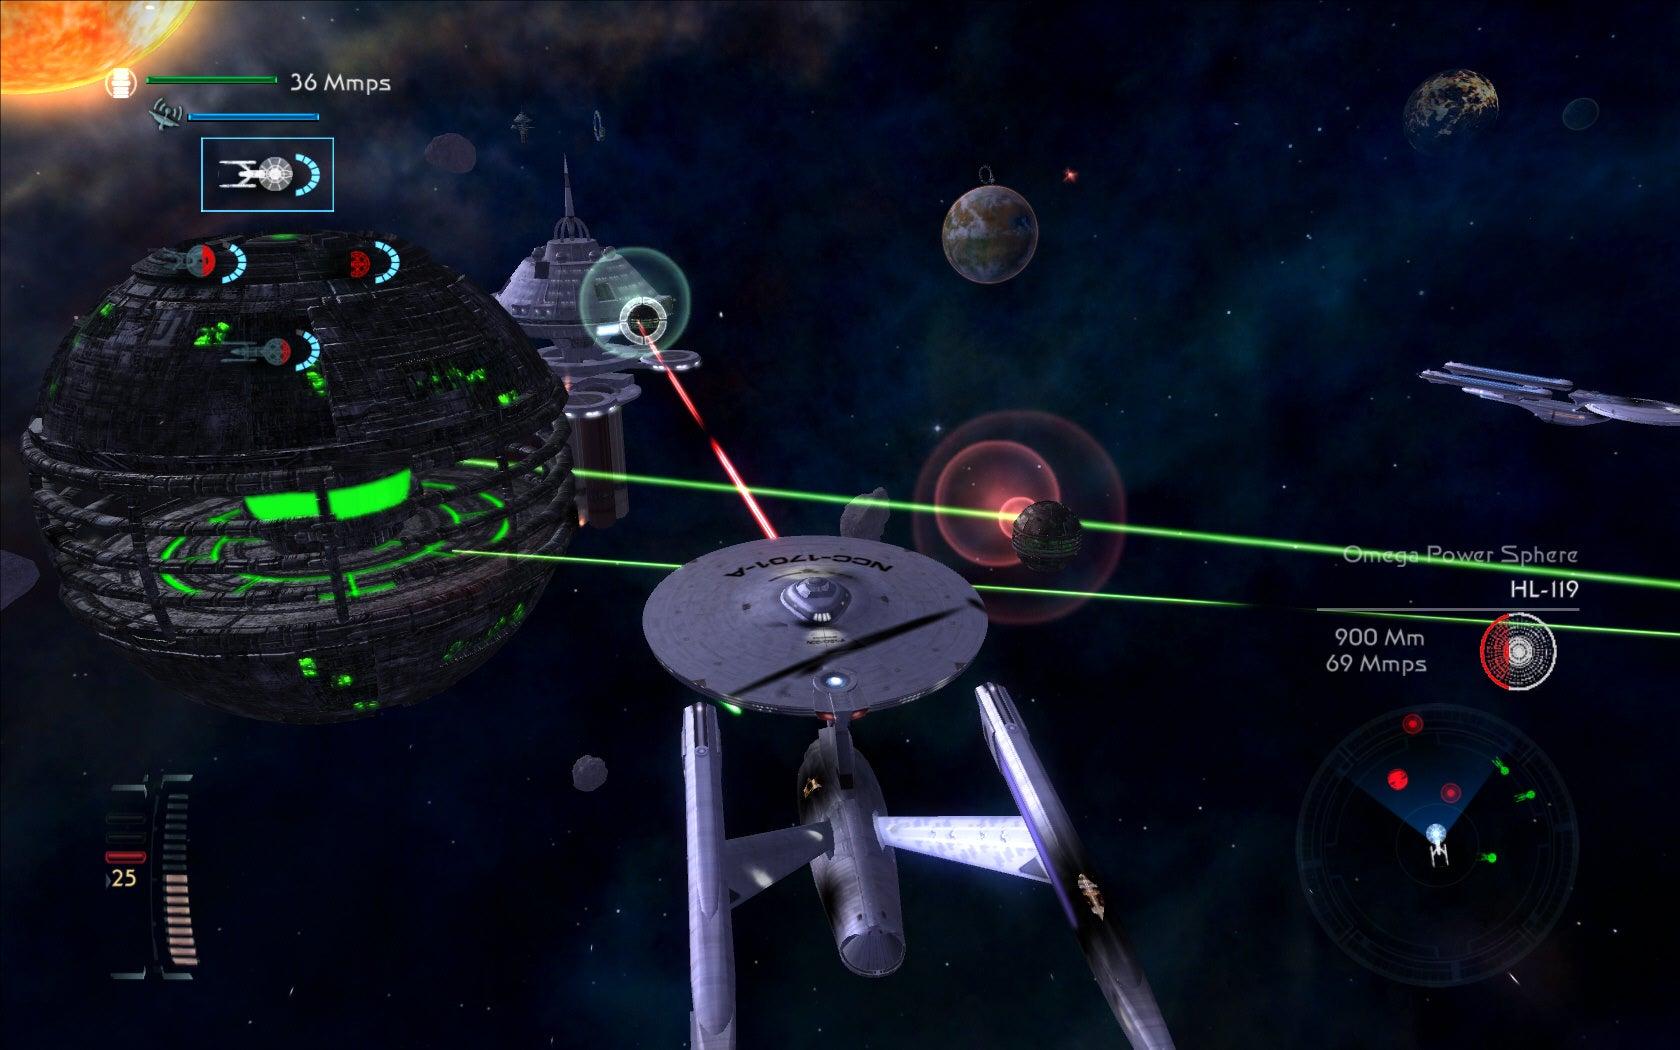 star trek legacy for pc single player review by abreu star trek rh videogamegeek com Star Trek Legacy YouTube Star Trek Legacy Class Starship